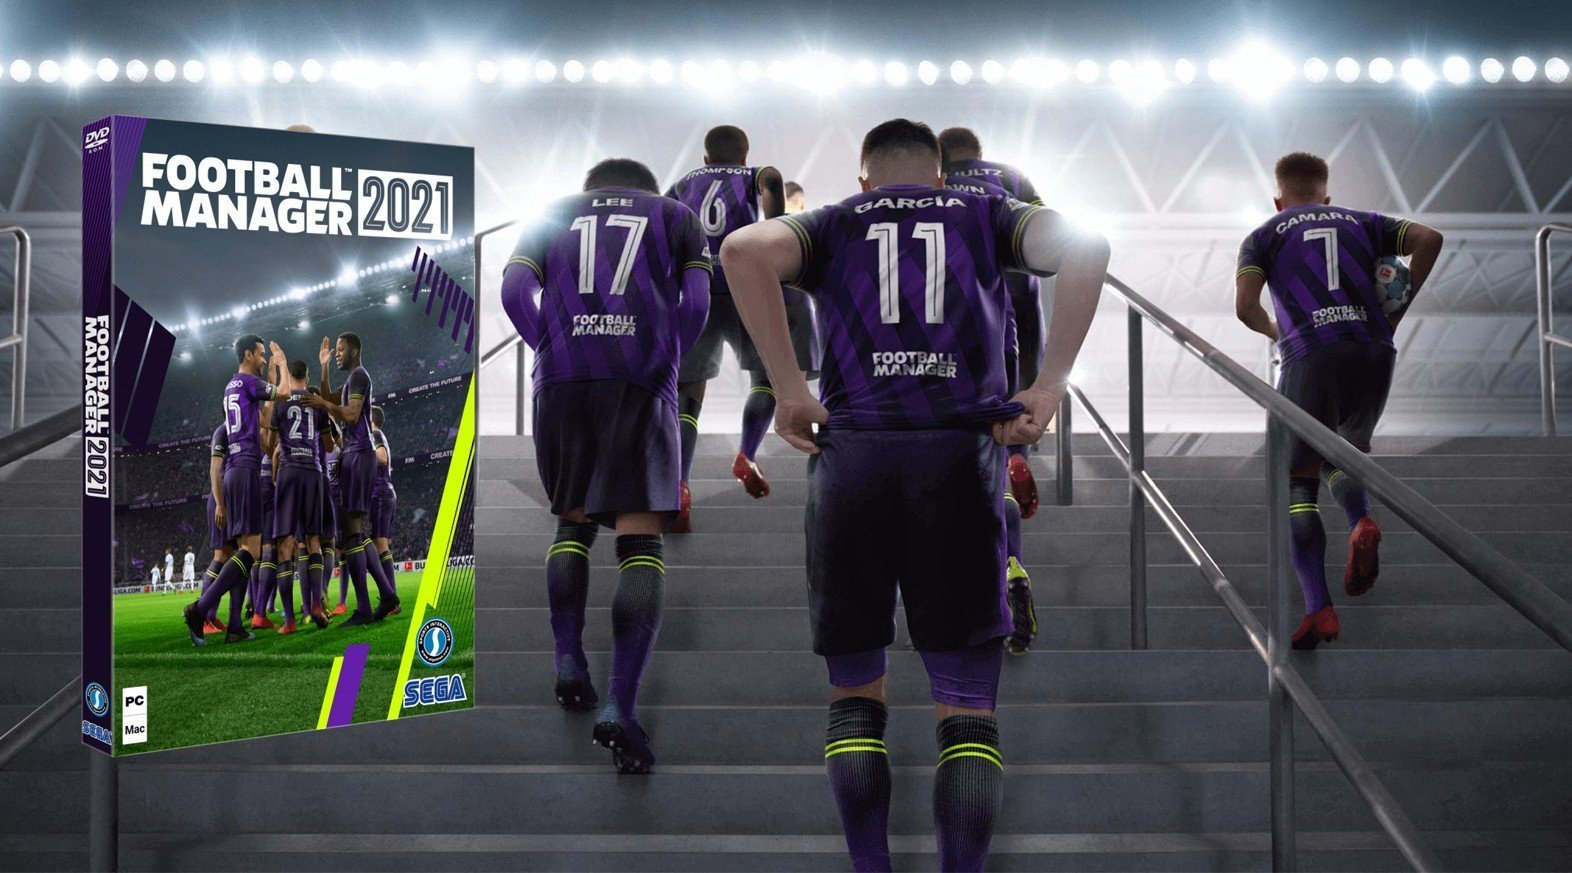 Footbal Manager 2021 - Screenshot